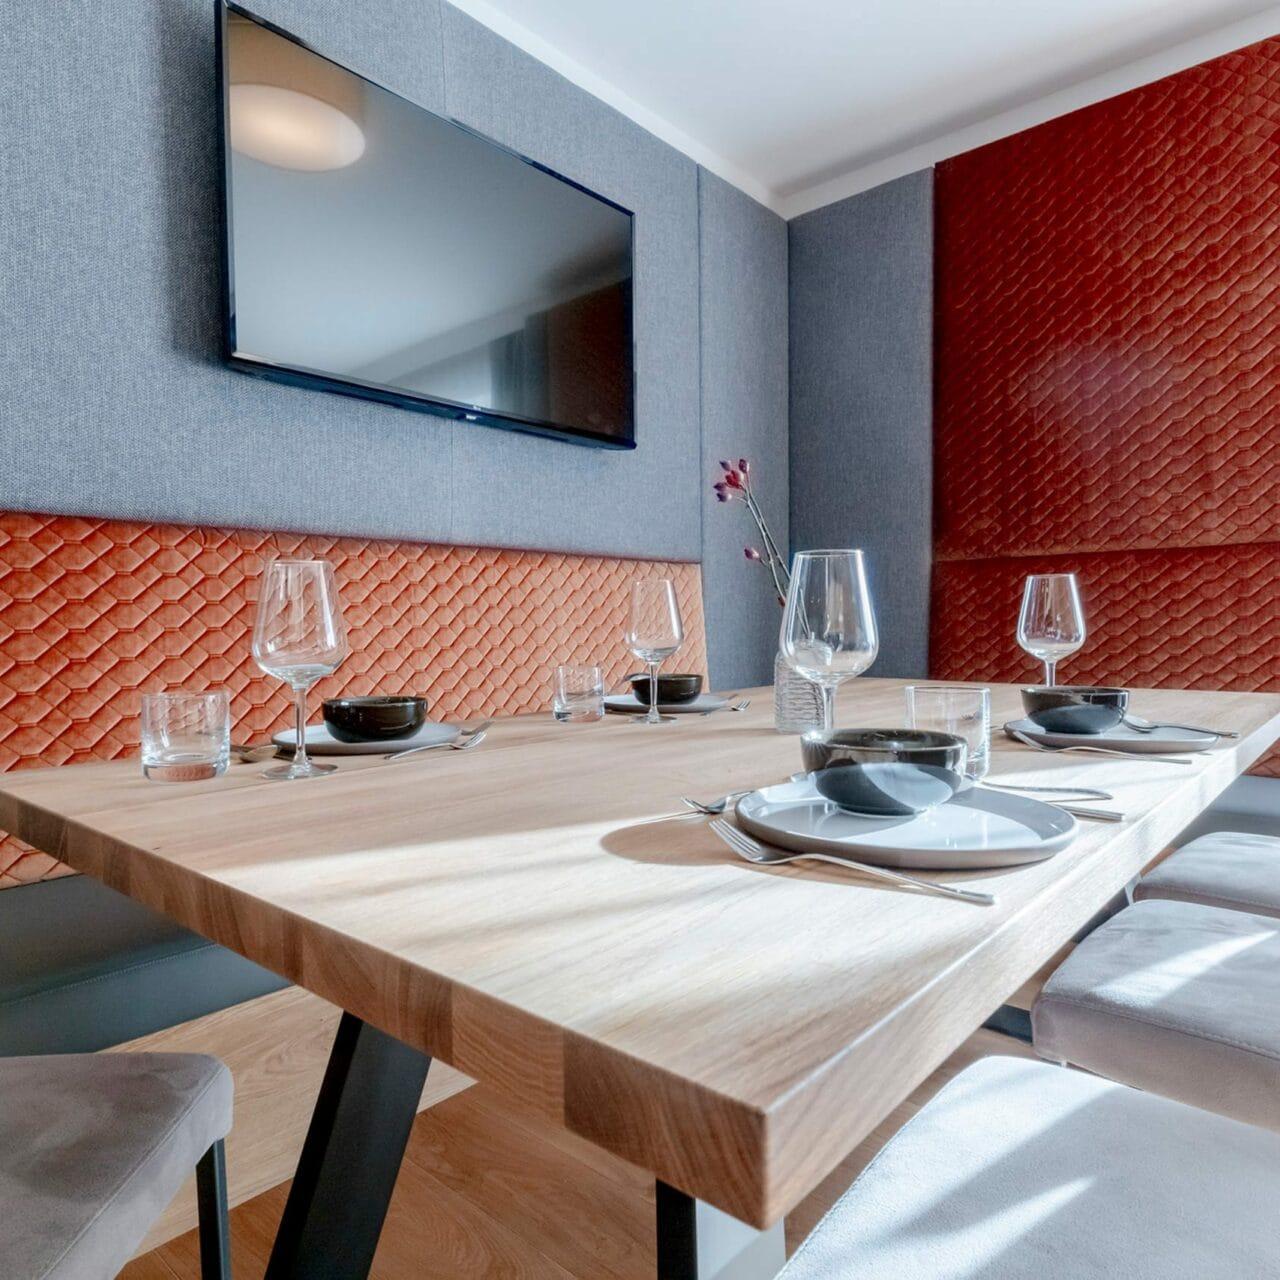 02-hofgut-apartment-lifestyle-resort-wagrain-salzburg-apartments-02